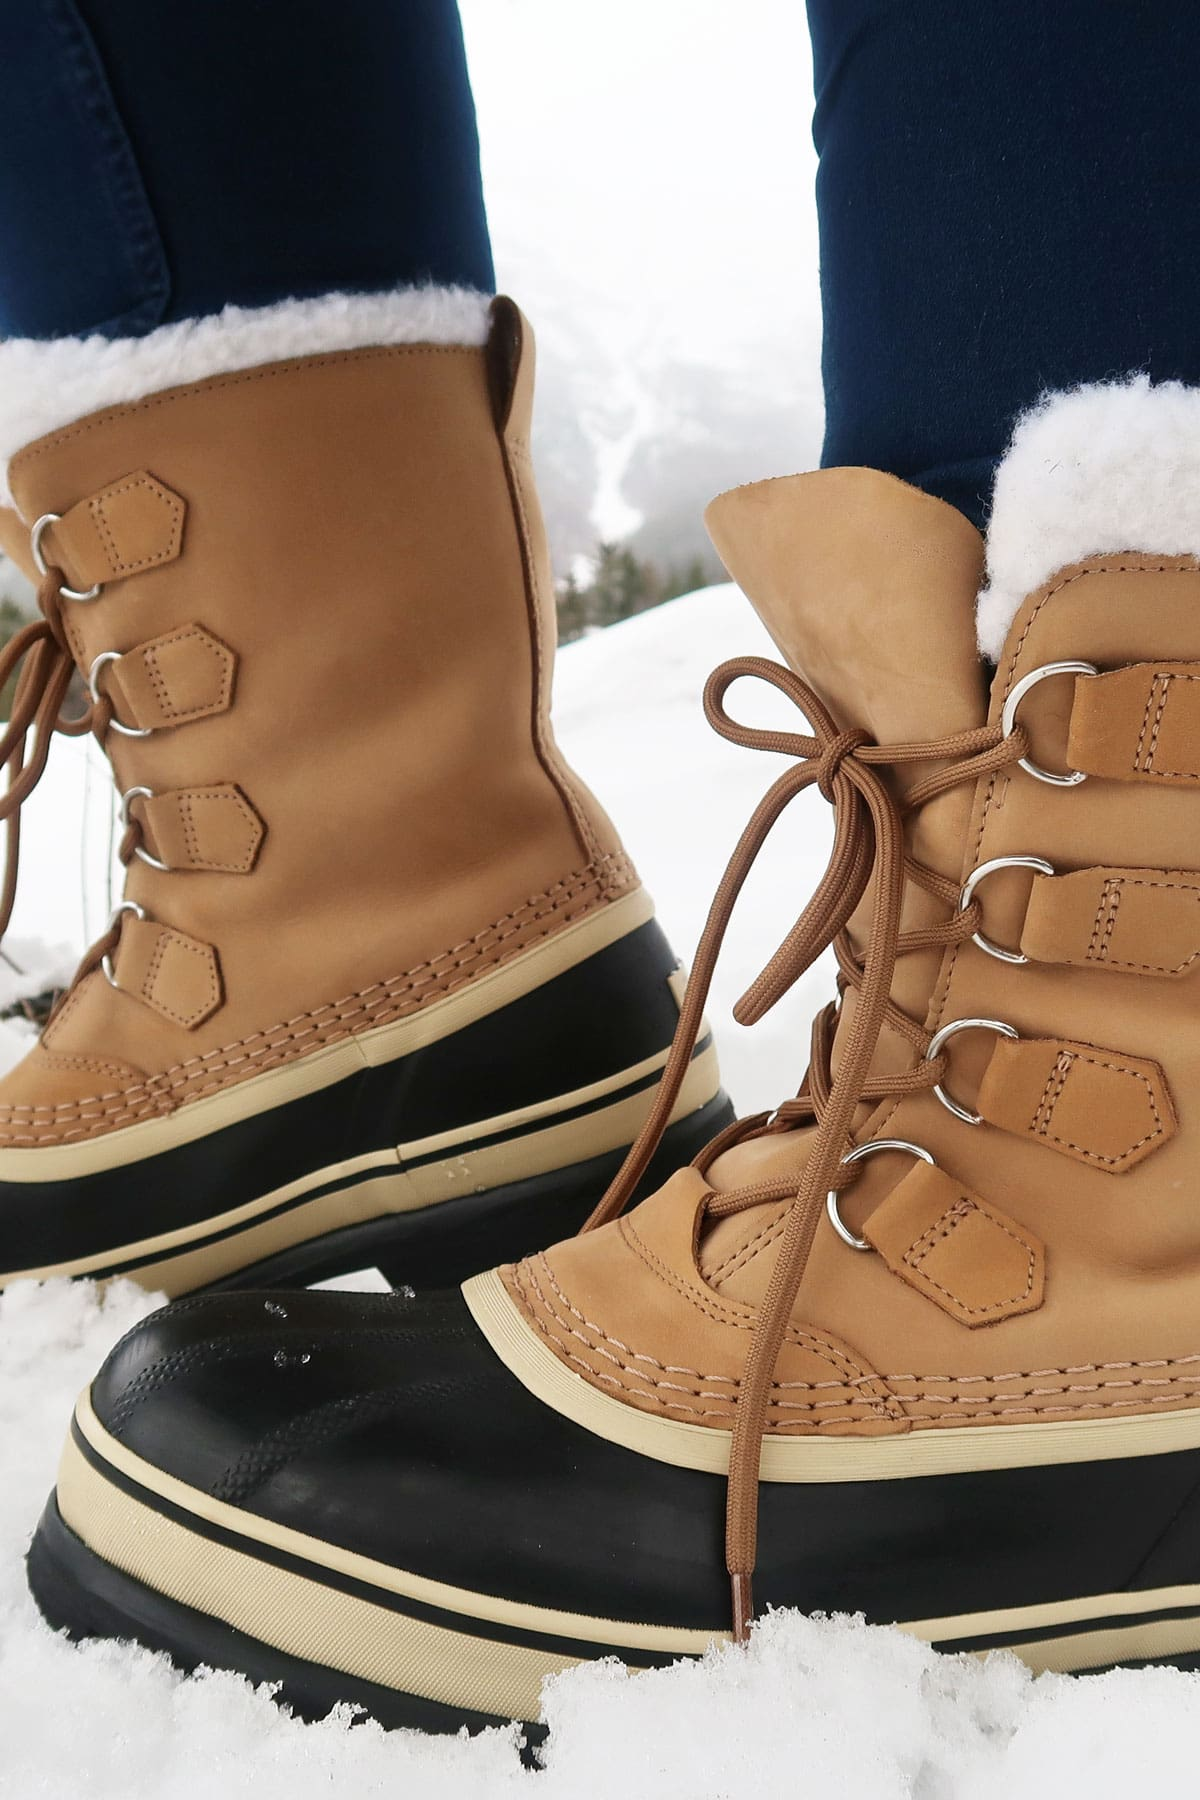 Sorel Caribou Snowboots Beige